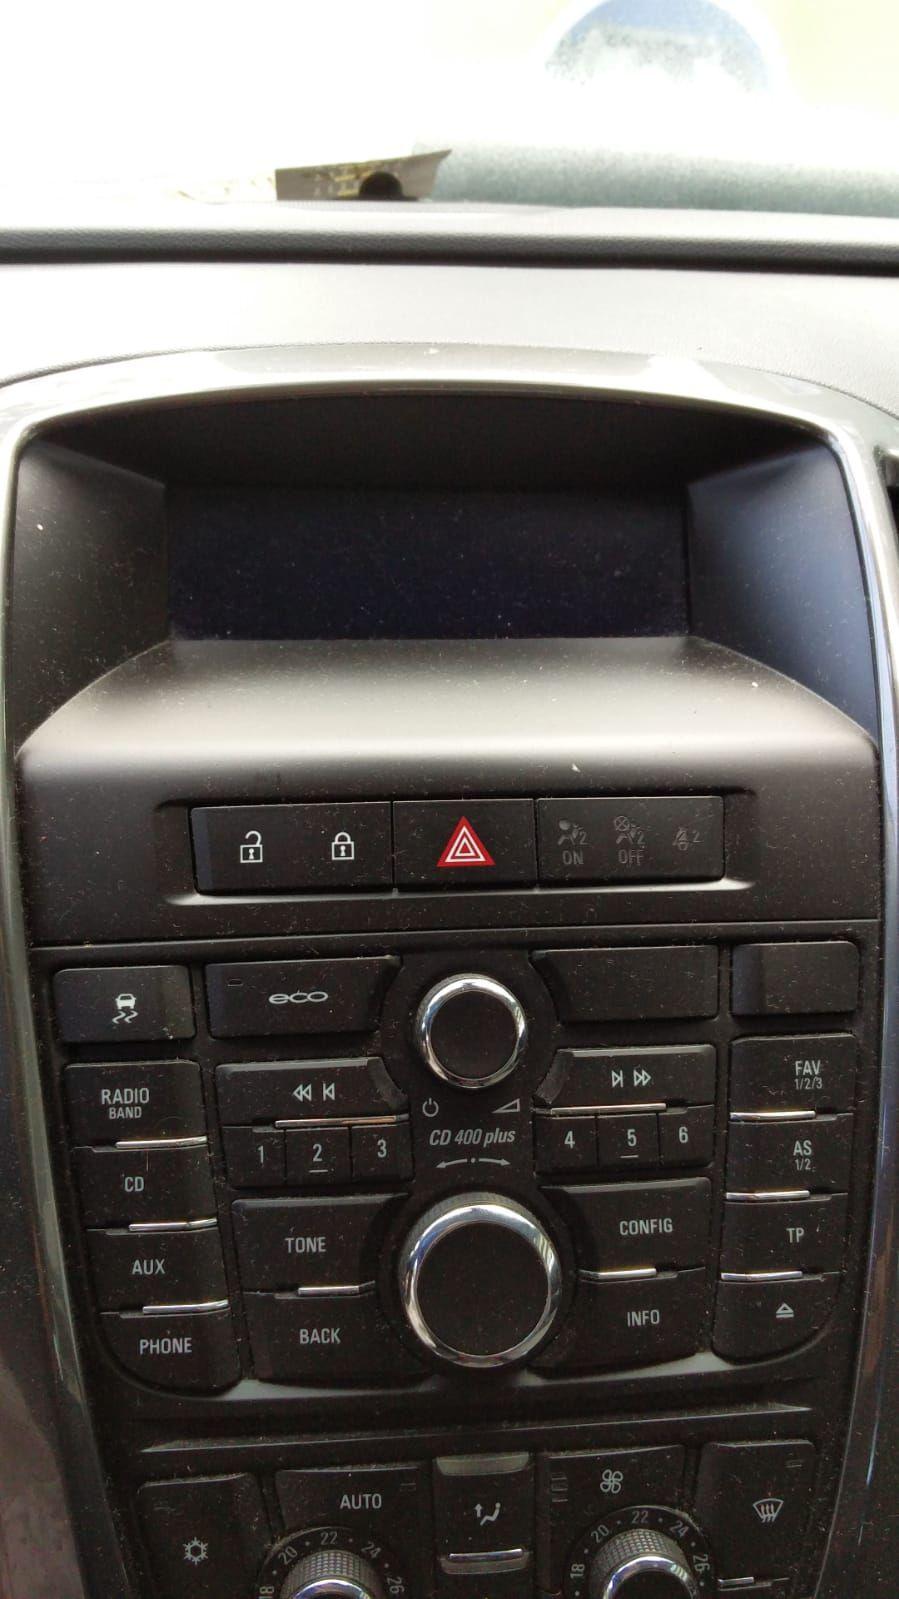 Autoradio Opel Astra J S Wagon Diesel 2012 Ricambi Usati 435491 Ebay